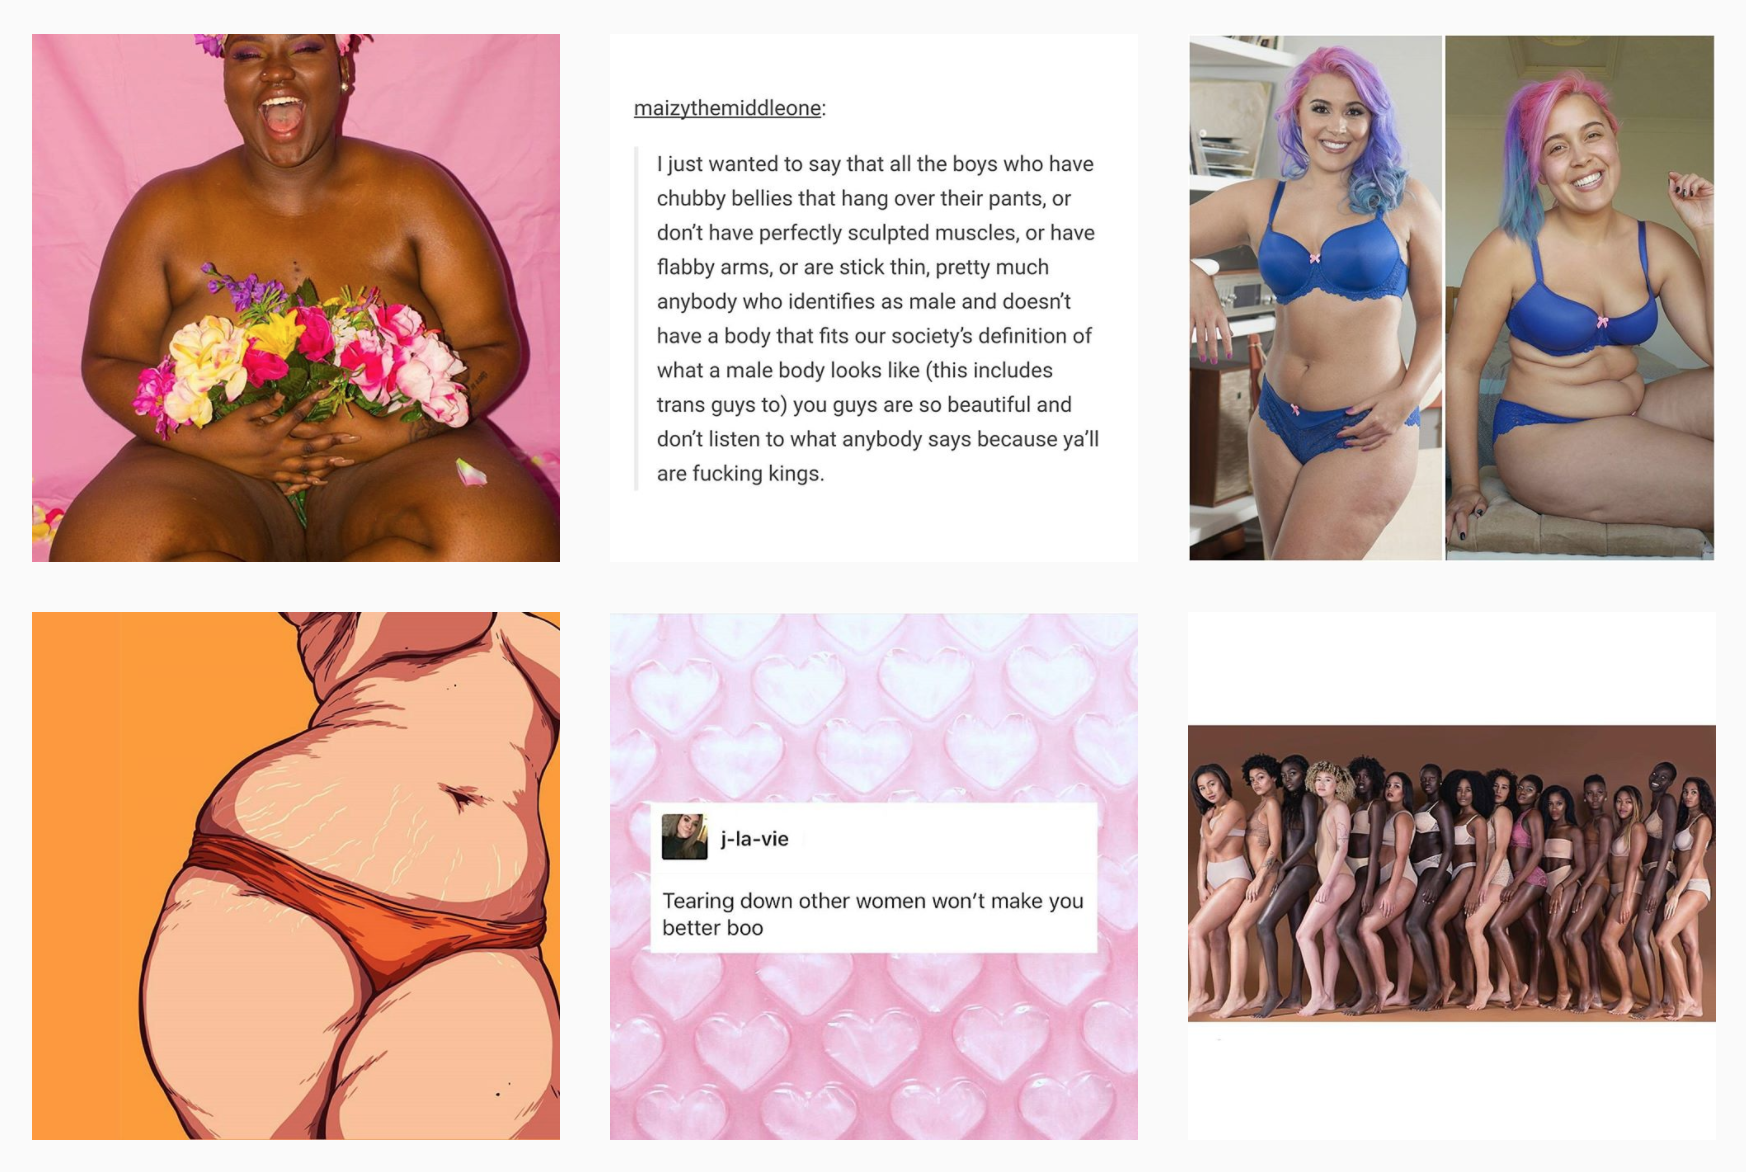 Megan Jayne Crabbe on Instagram as @bodyposipanda